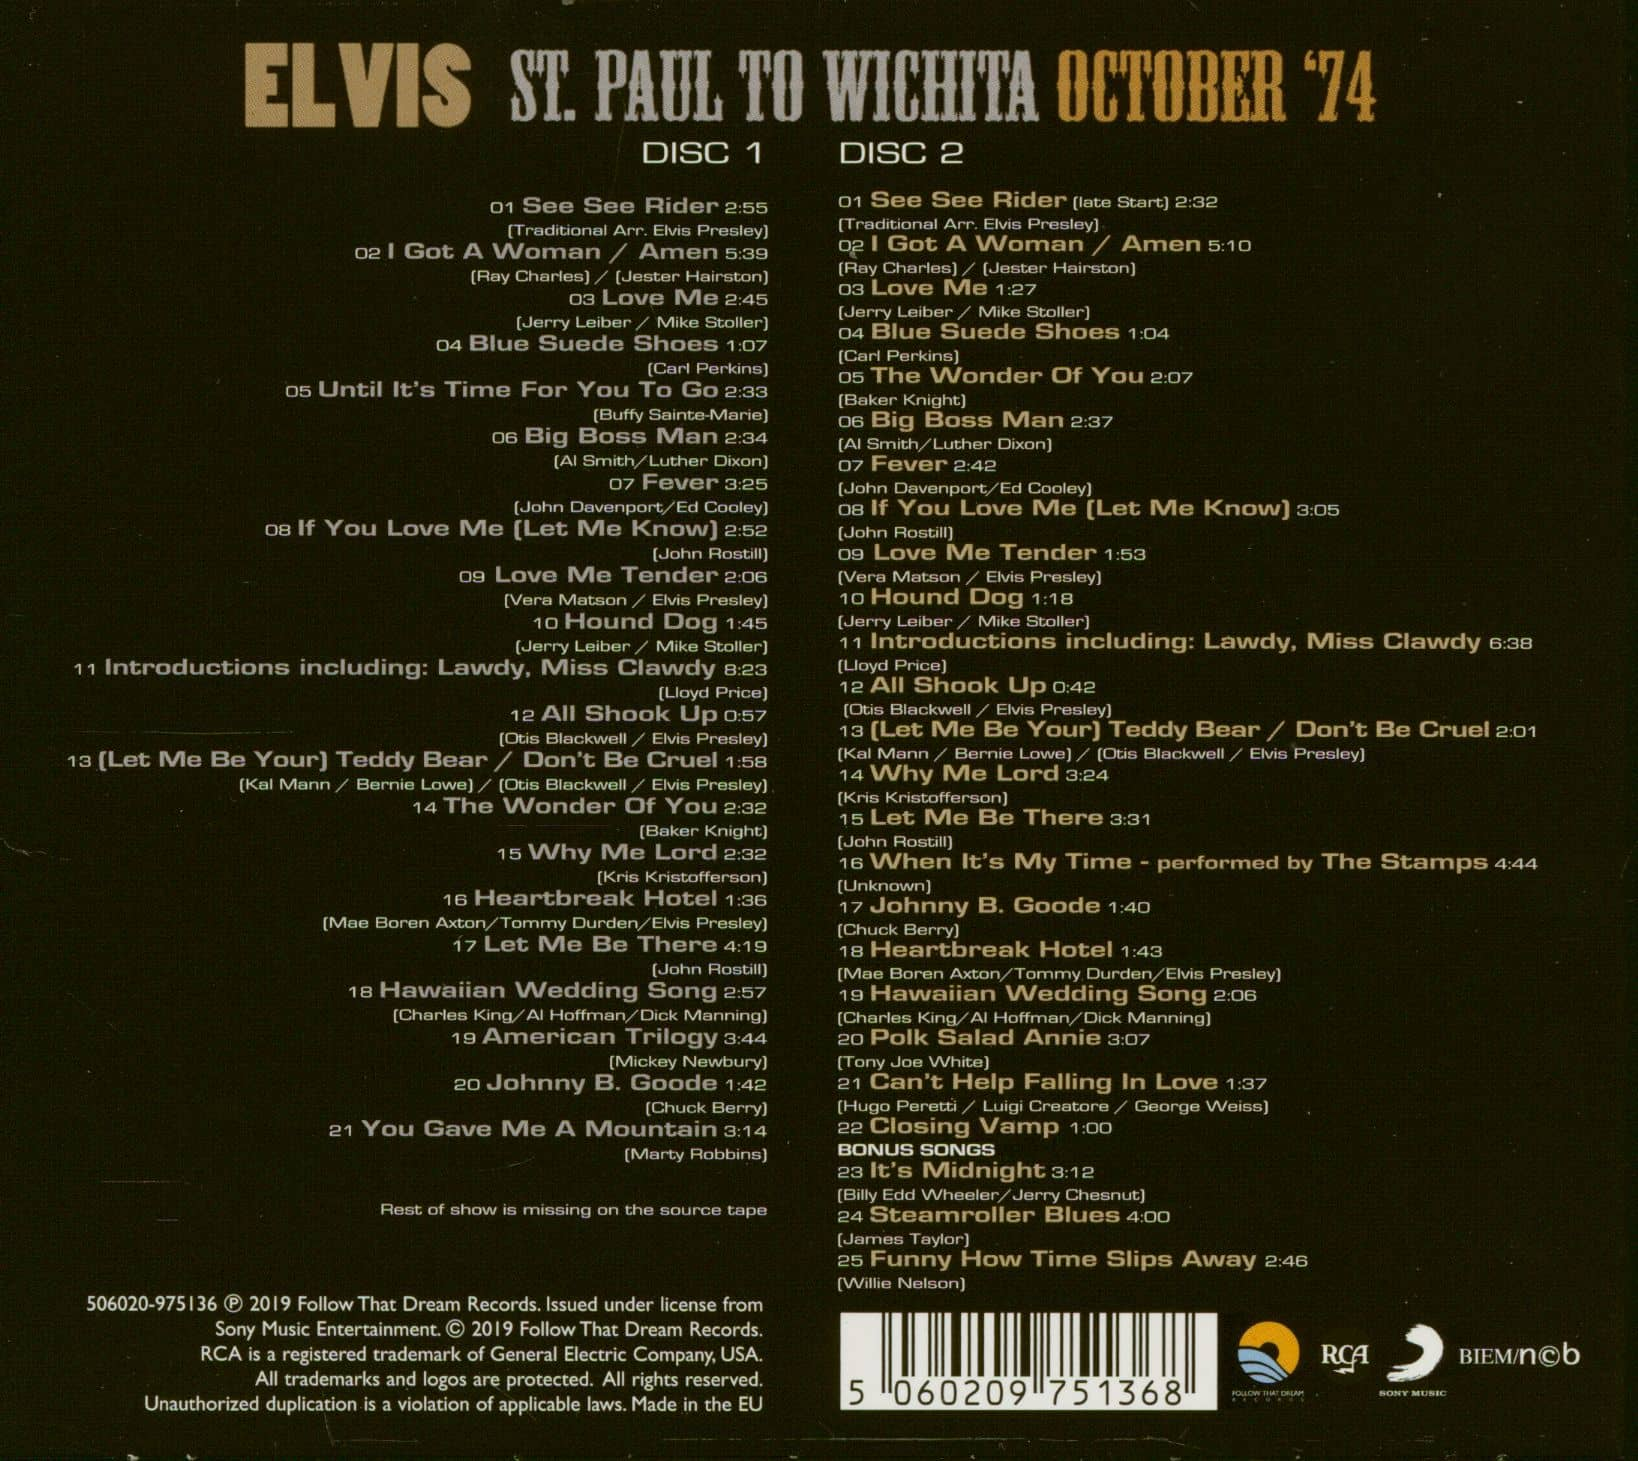 Elvis Presley Cd St Paul To Wichita October 74 2 Cd